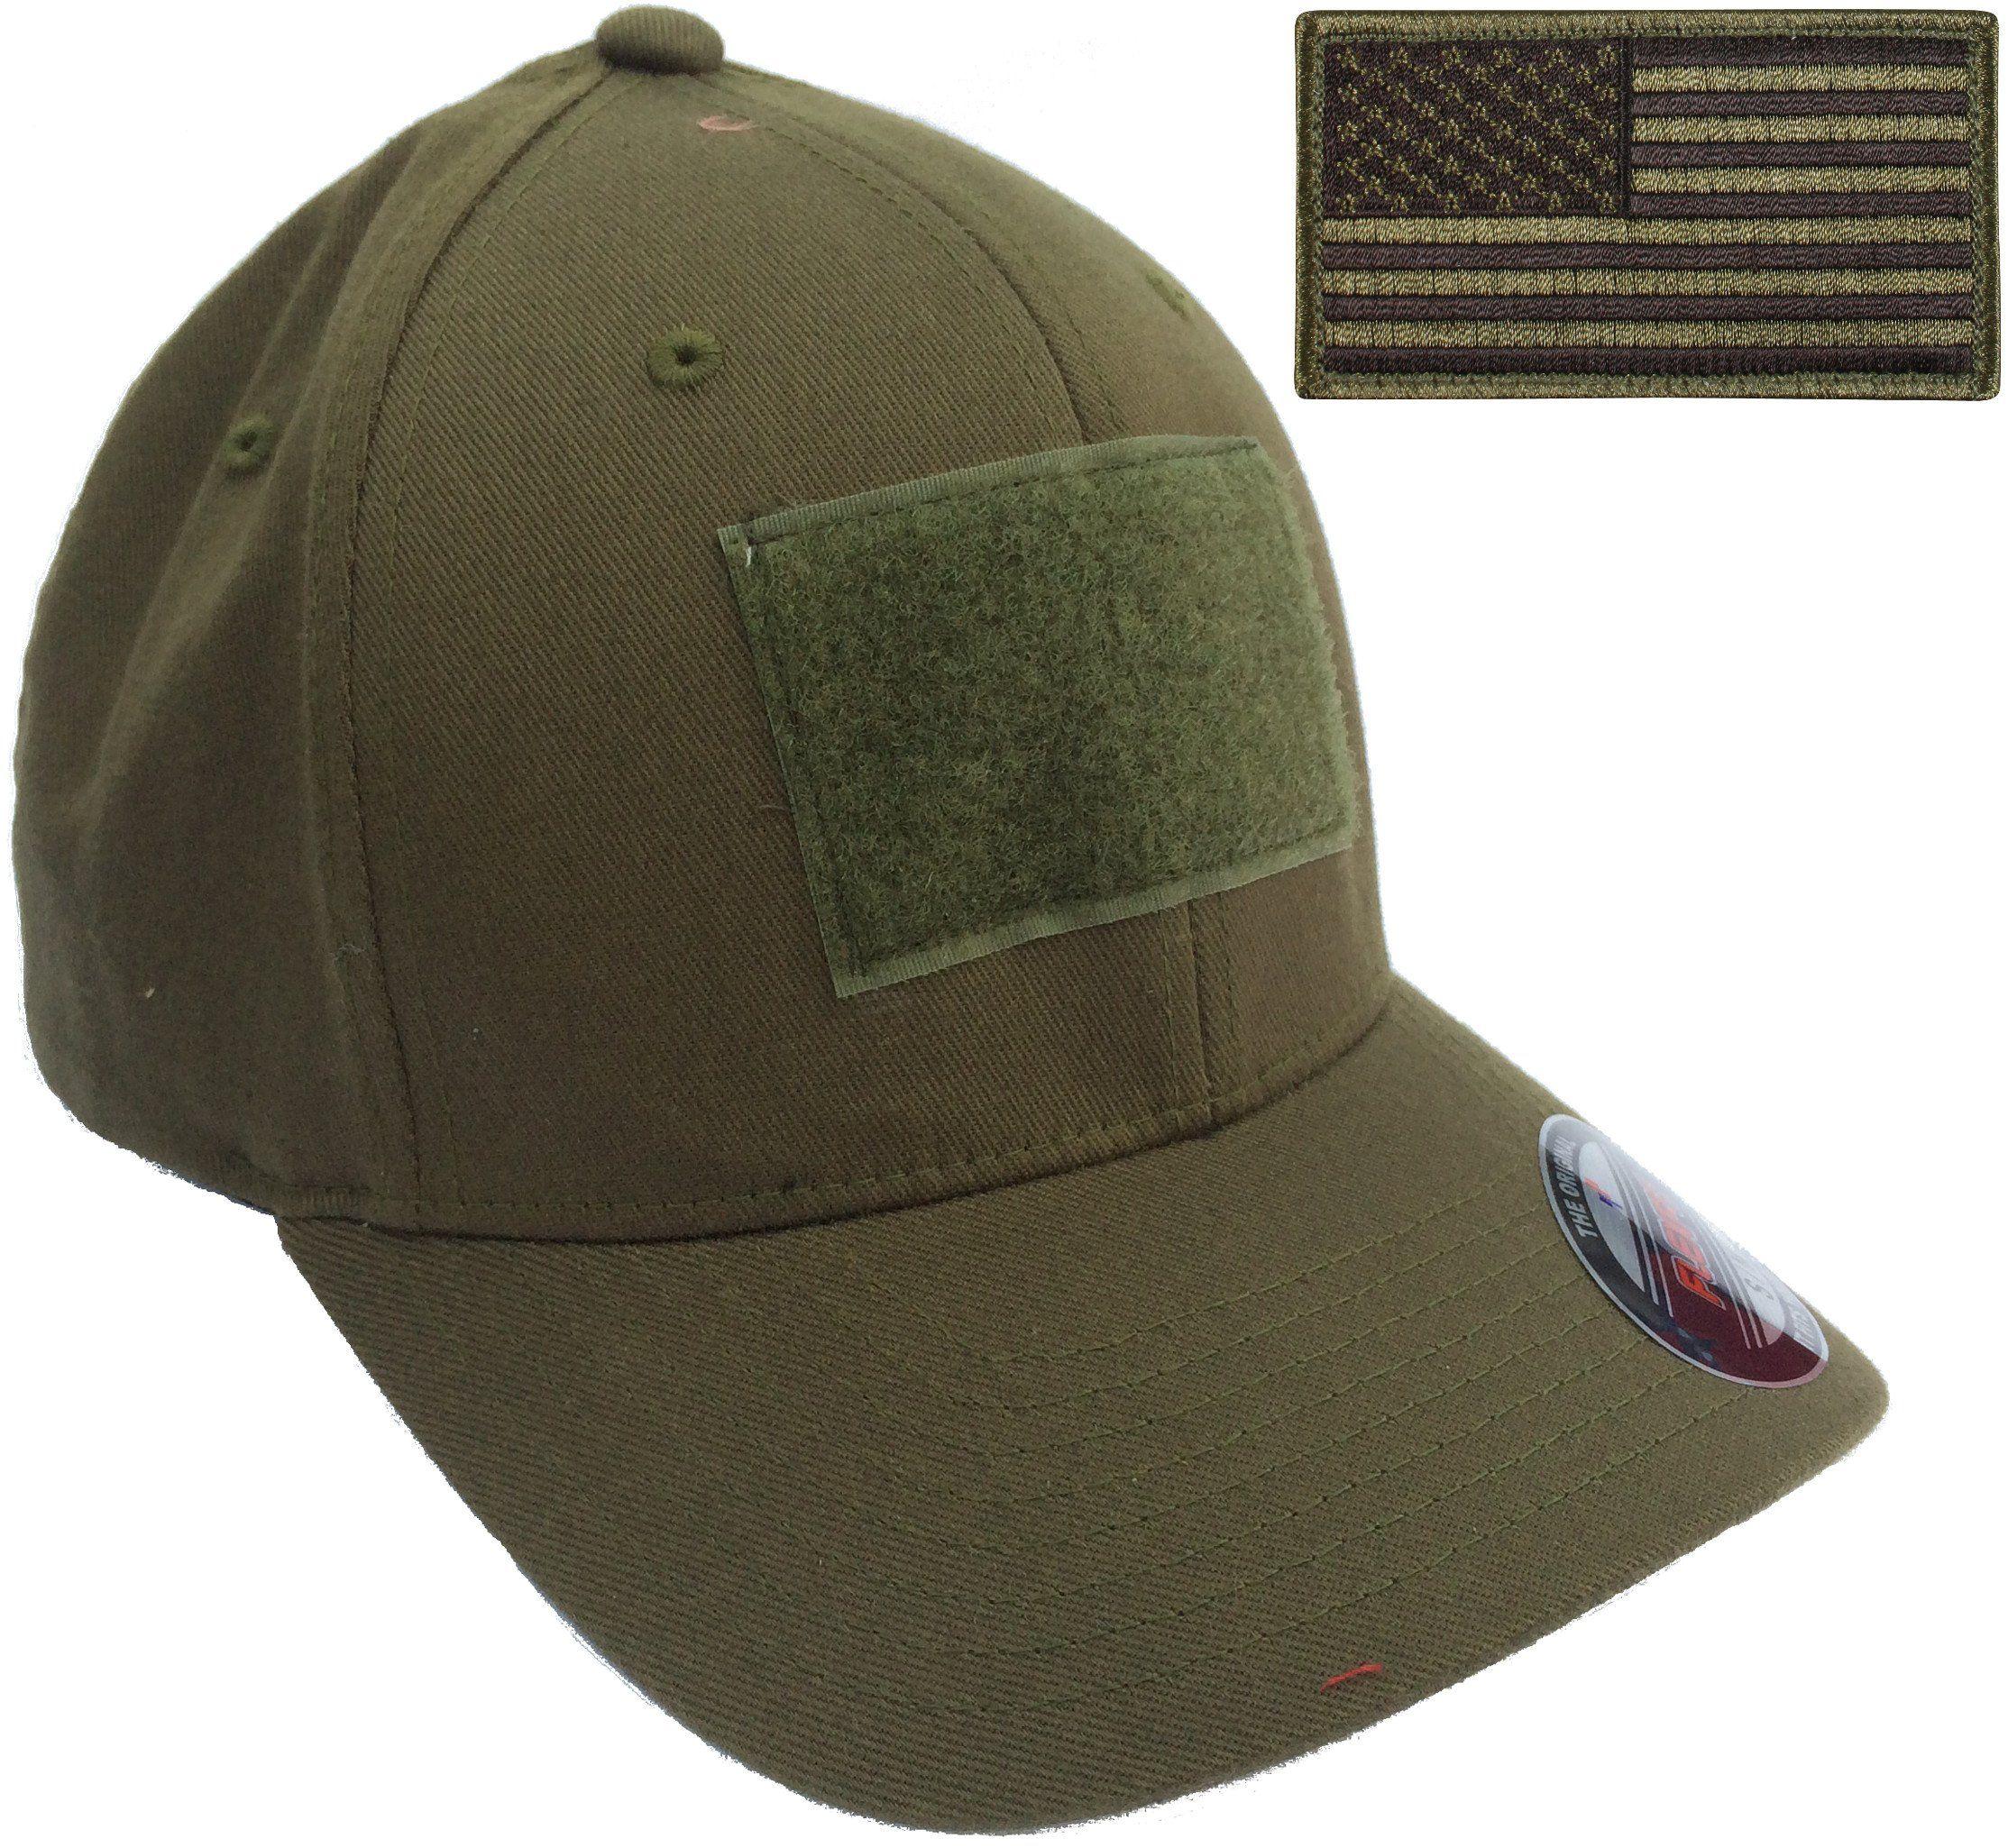 ba601d39fabfd Men s Fitted 98% Cotton Flexfit Mid Profile Tactical Cap w Velcro Area and  Patch